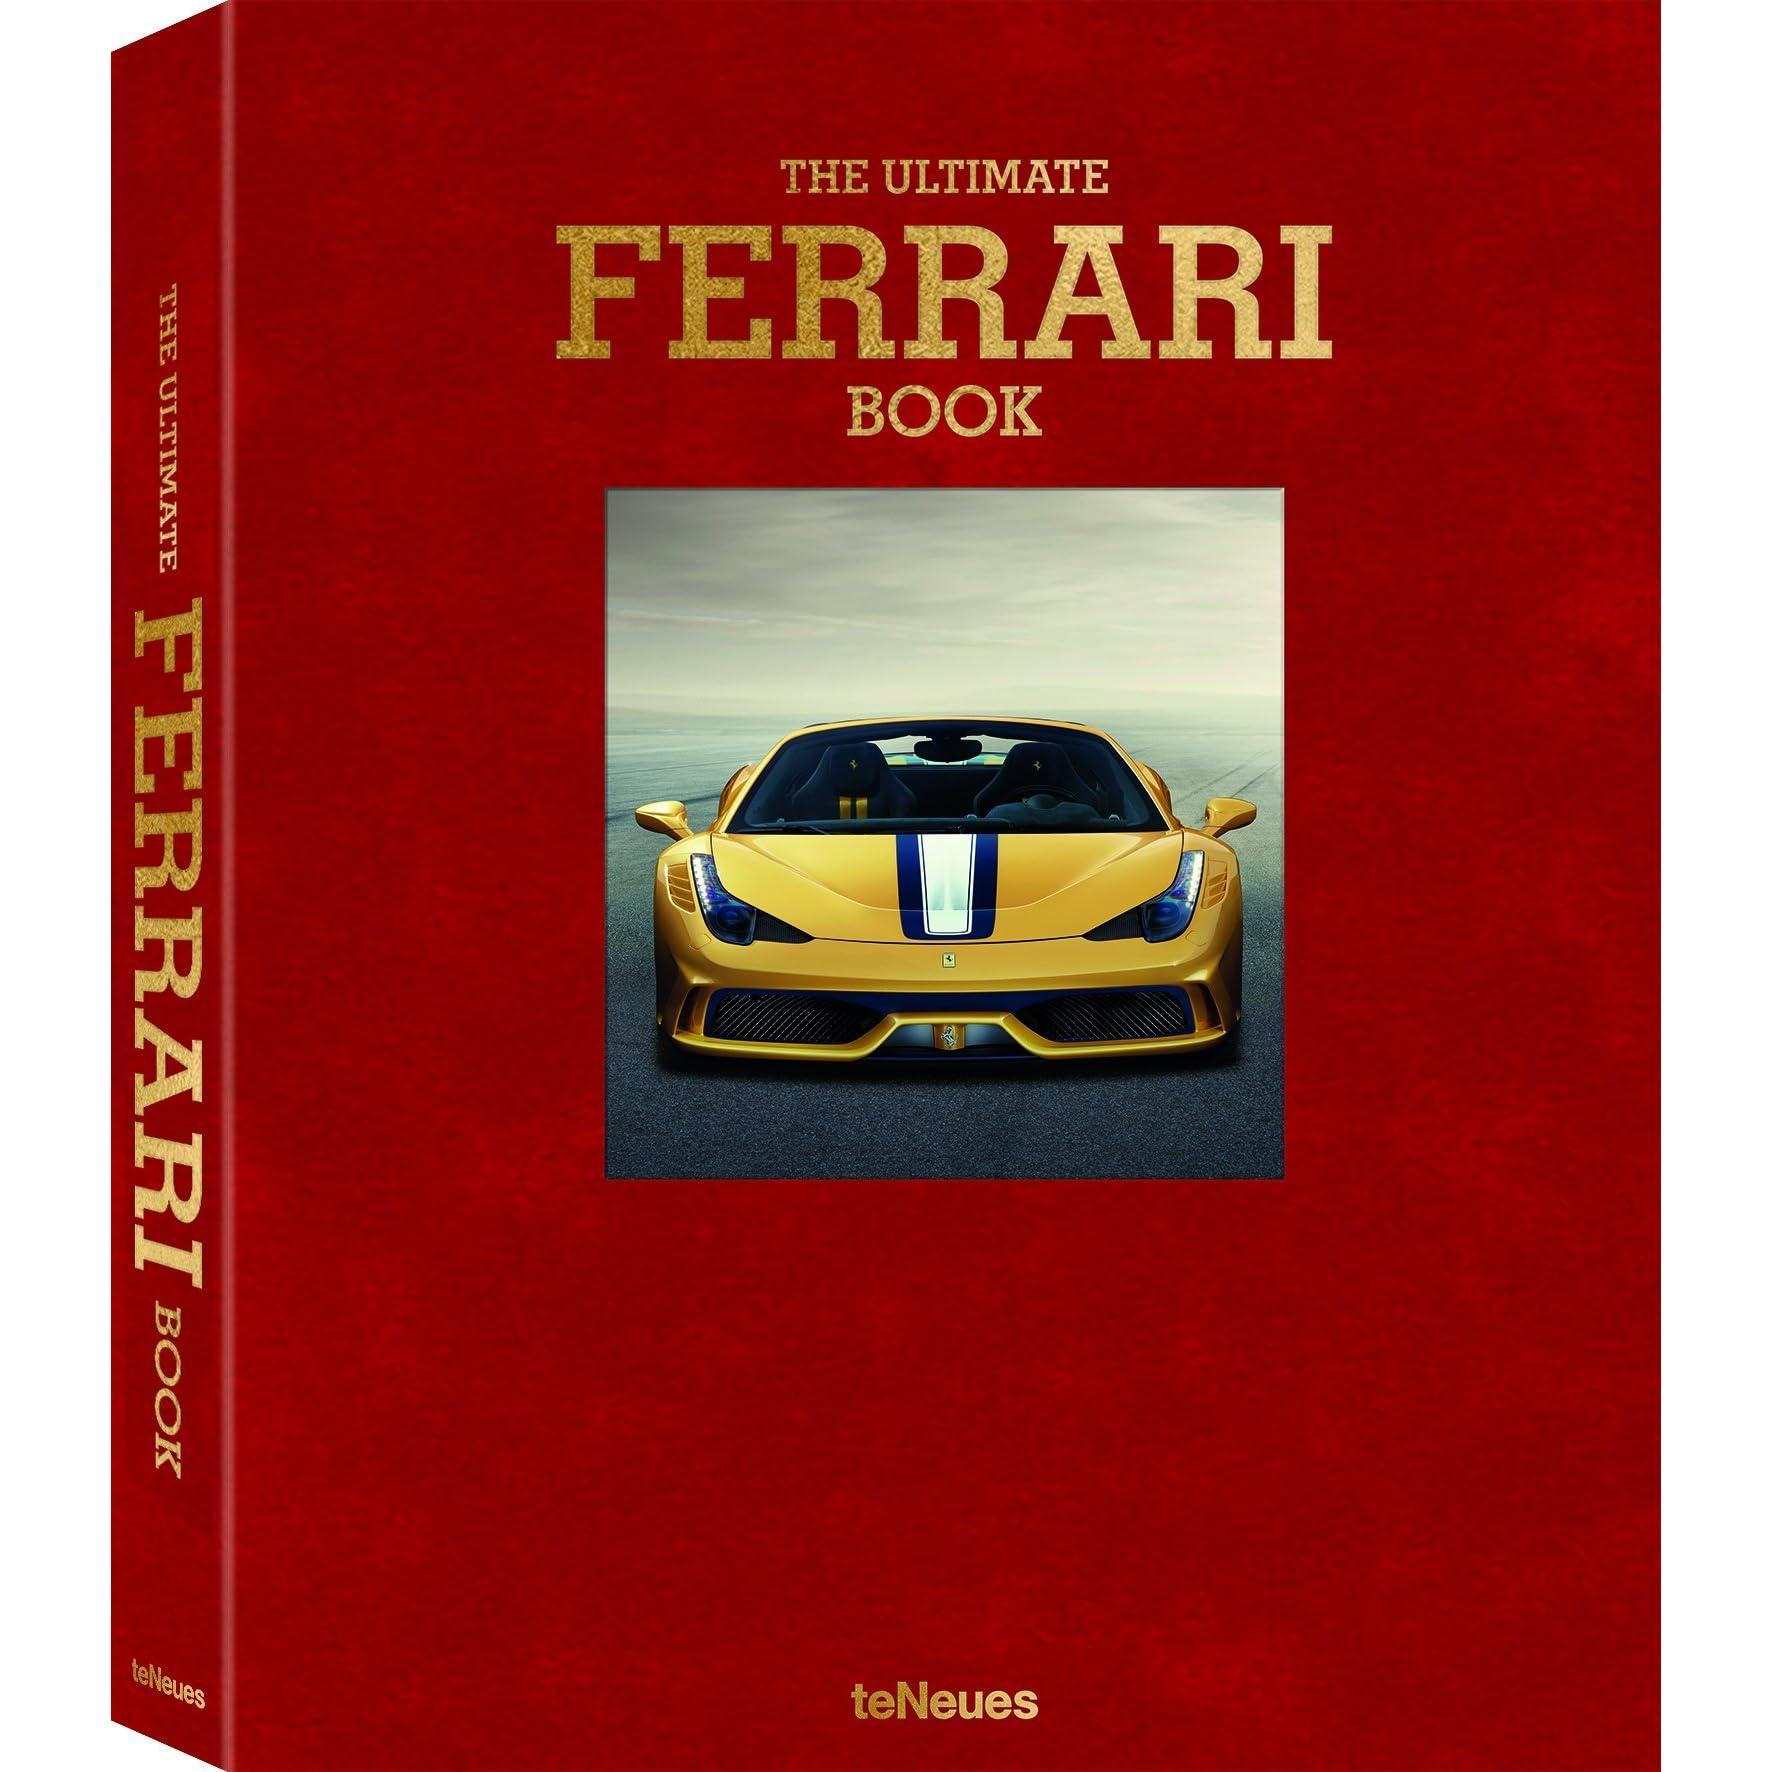 The Ultimate Ferrari Book By Michael Kockritz